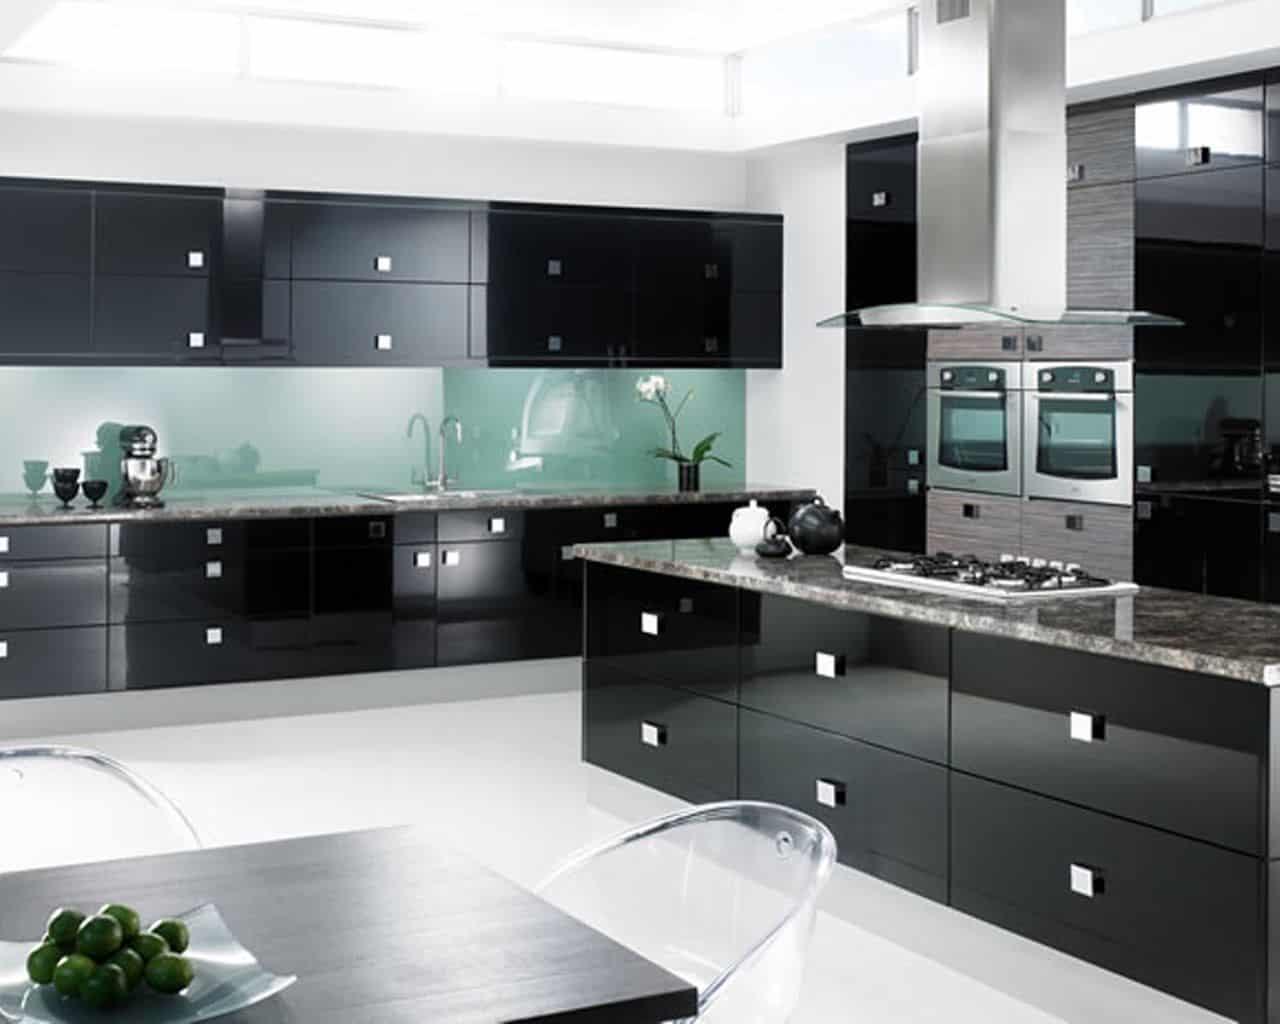 Fullsize Of Black Cabinet Kitchens